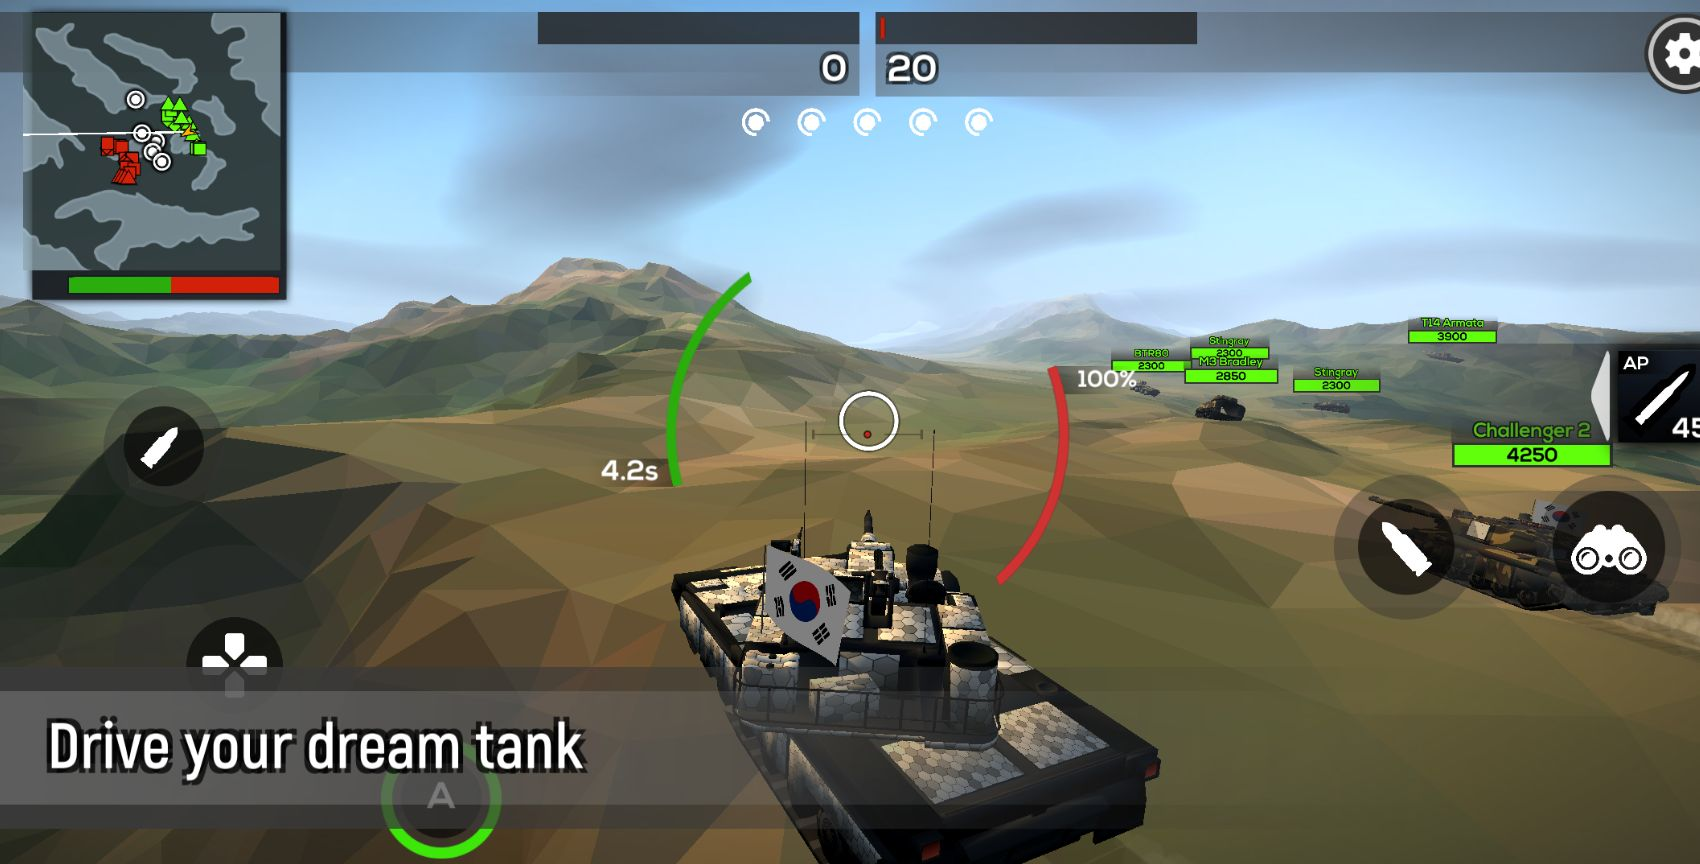 Poly Tank 2: Battle Sandbox captura de pantalla 1